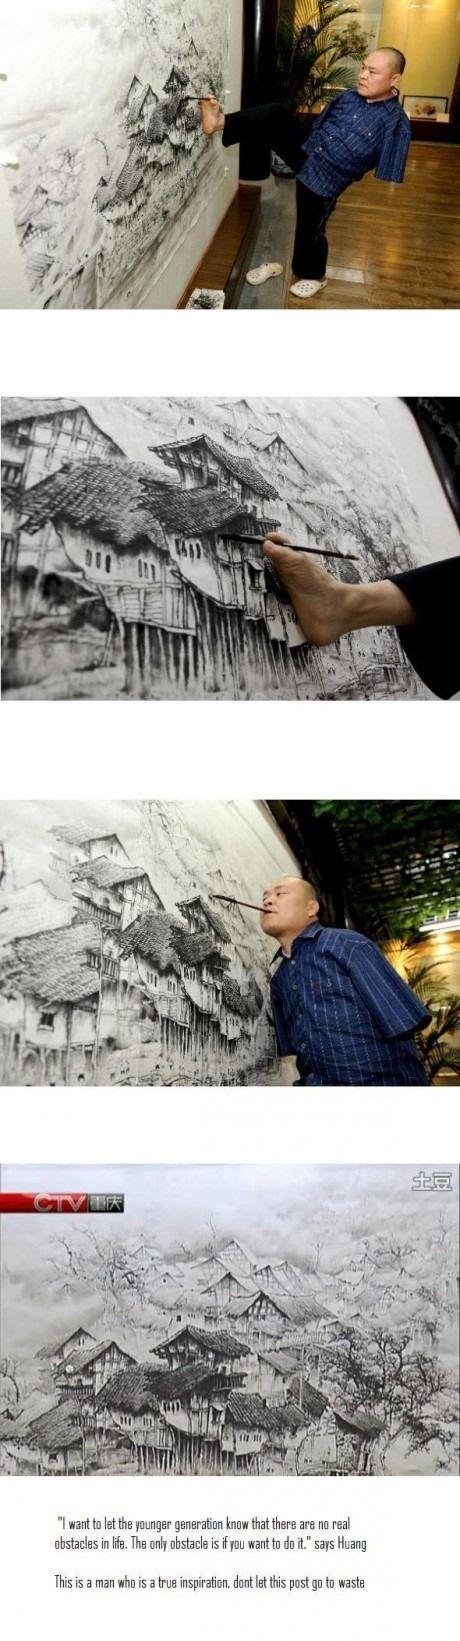 not cool but amazing! make art no matter what.